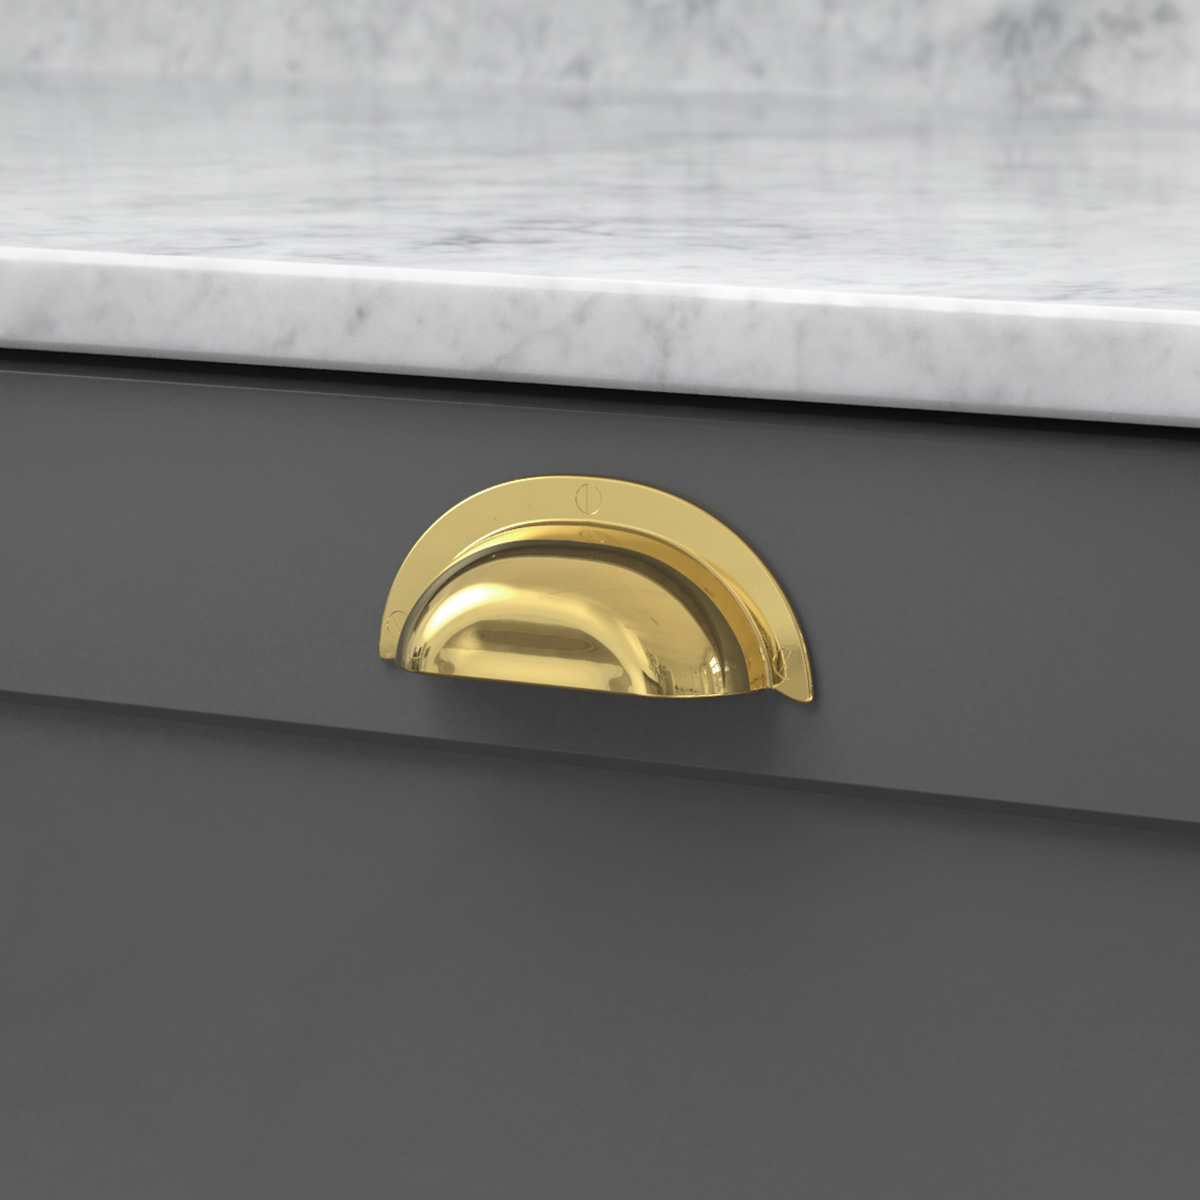 Skålhand 3922 massing 3923 11 ncs s 7500 n marmor carrara